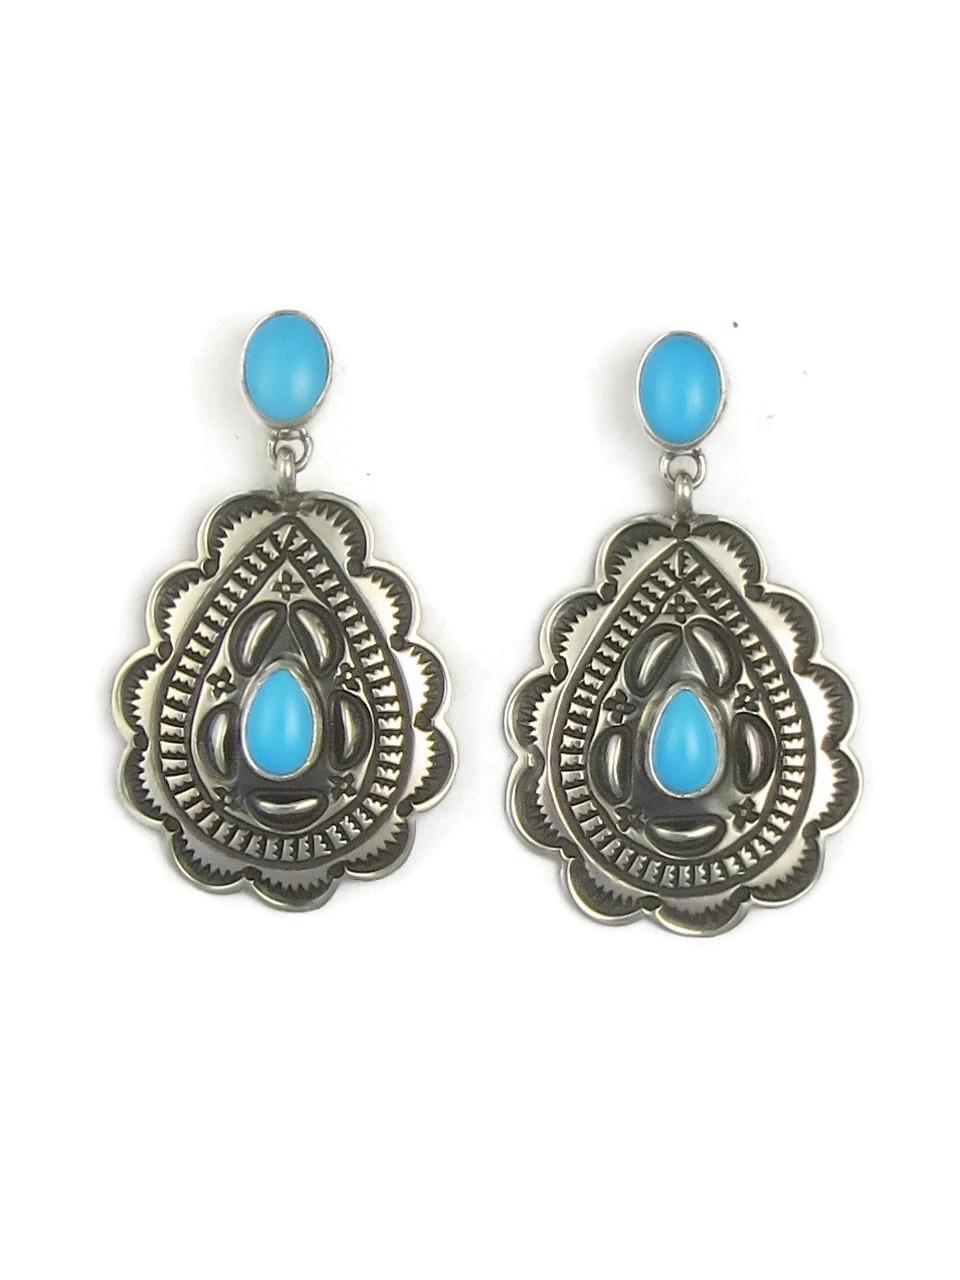 Sleeping Beauty Turquoise Silver Concho Earrings By Tsosie White